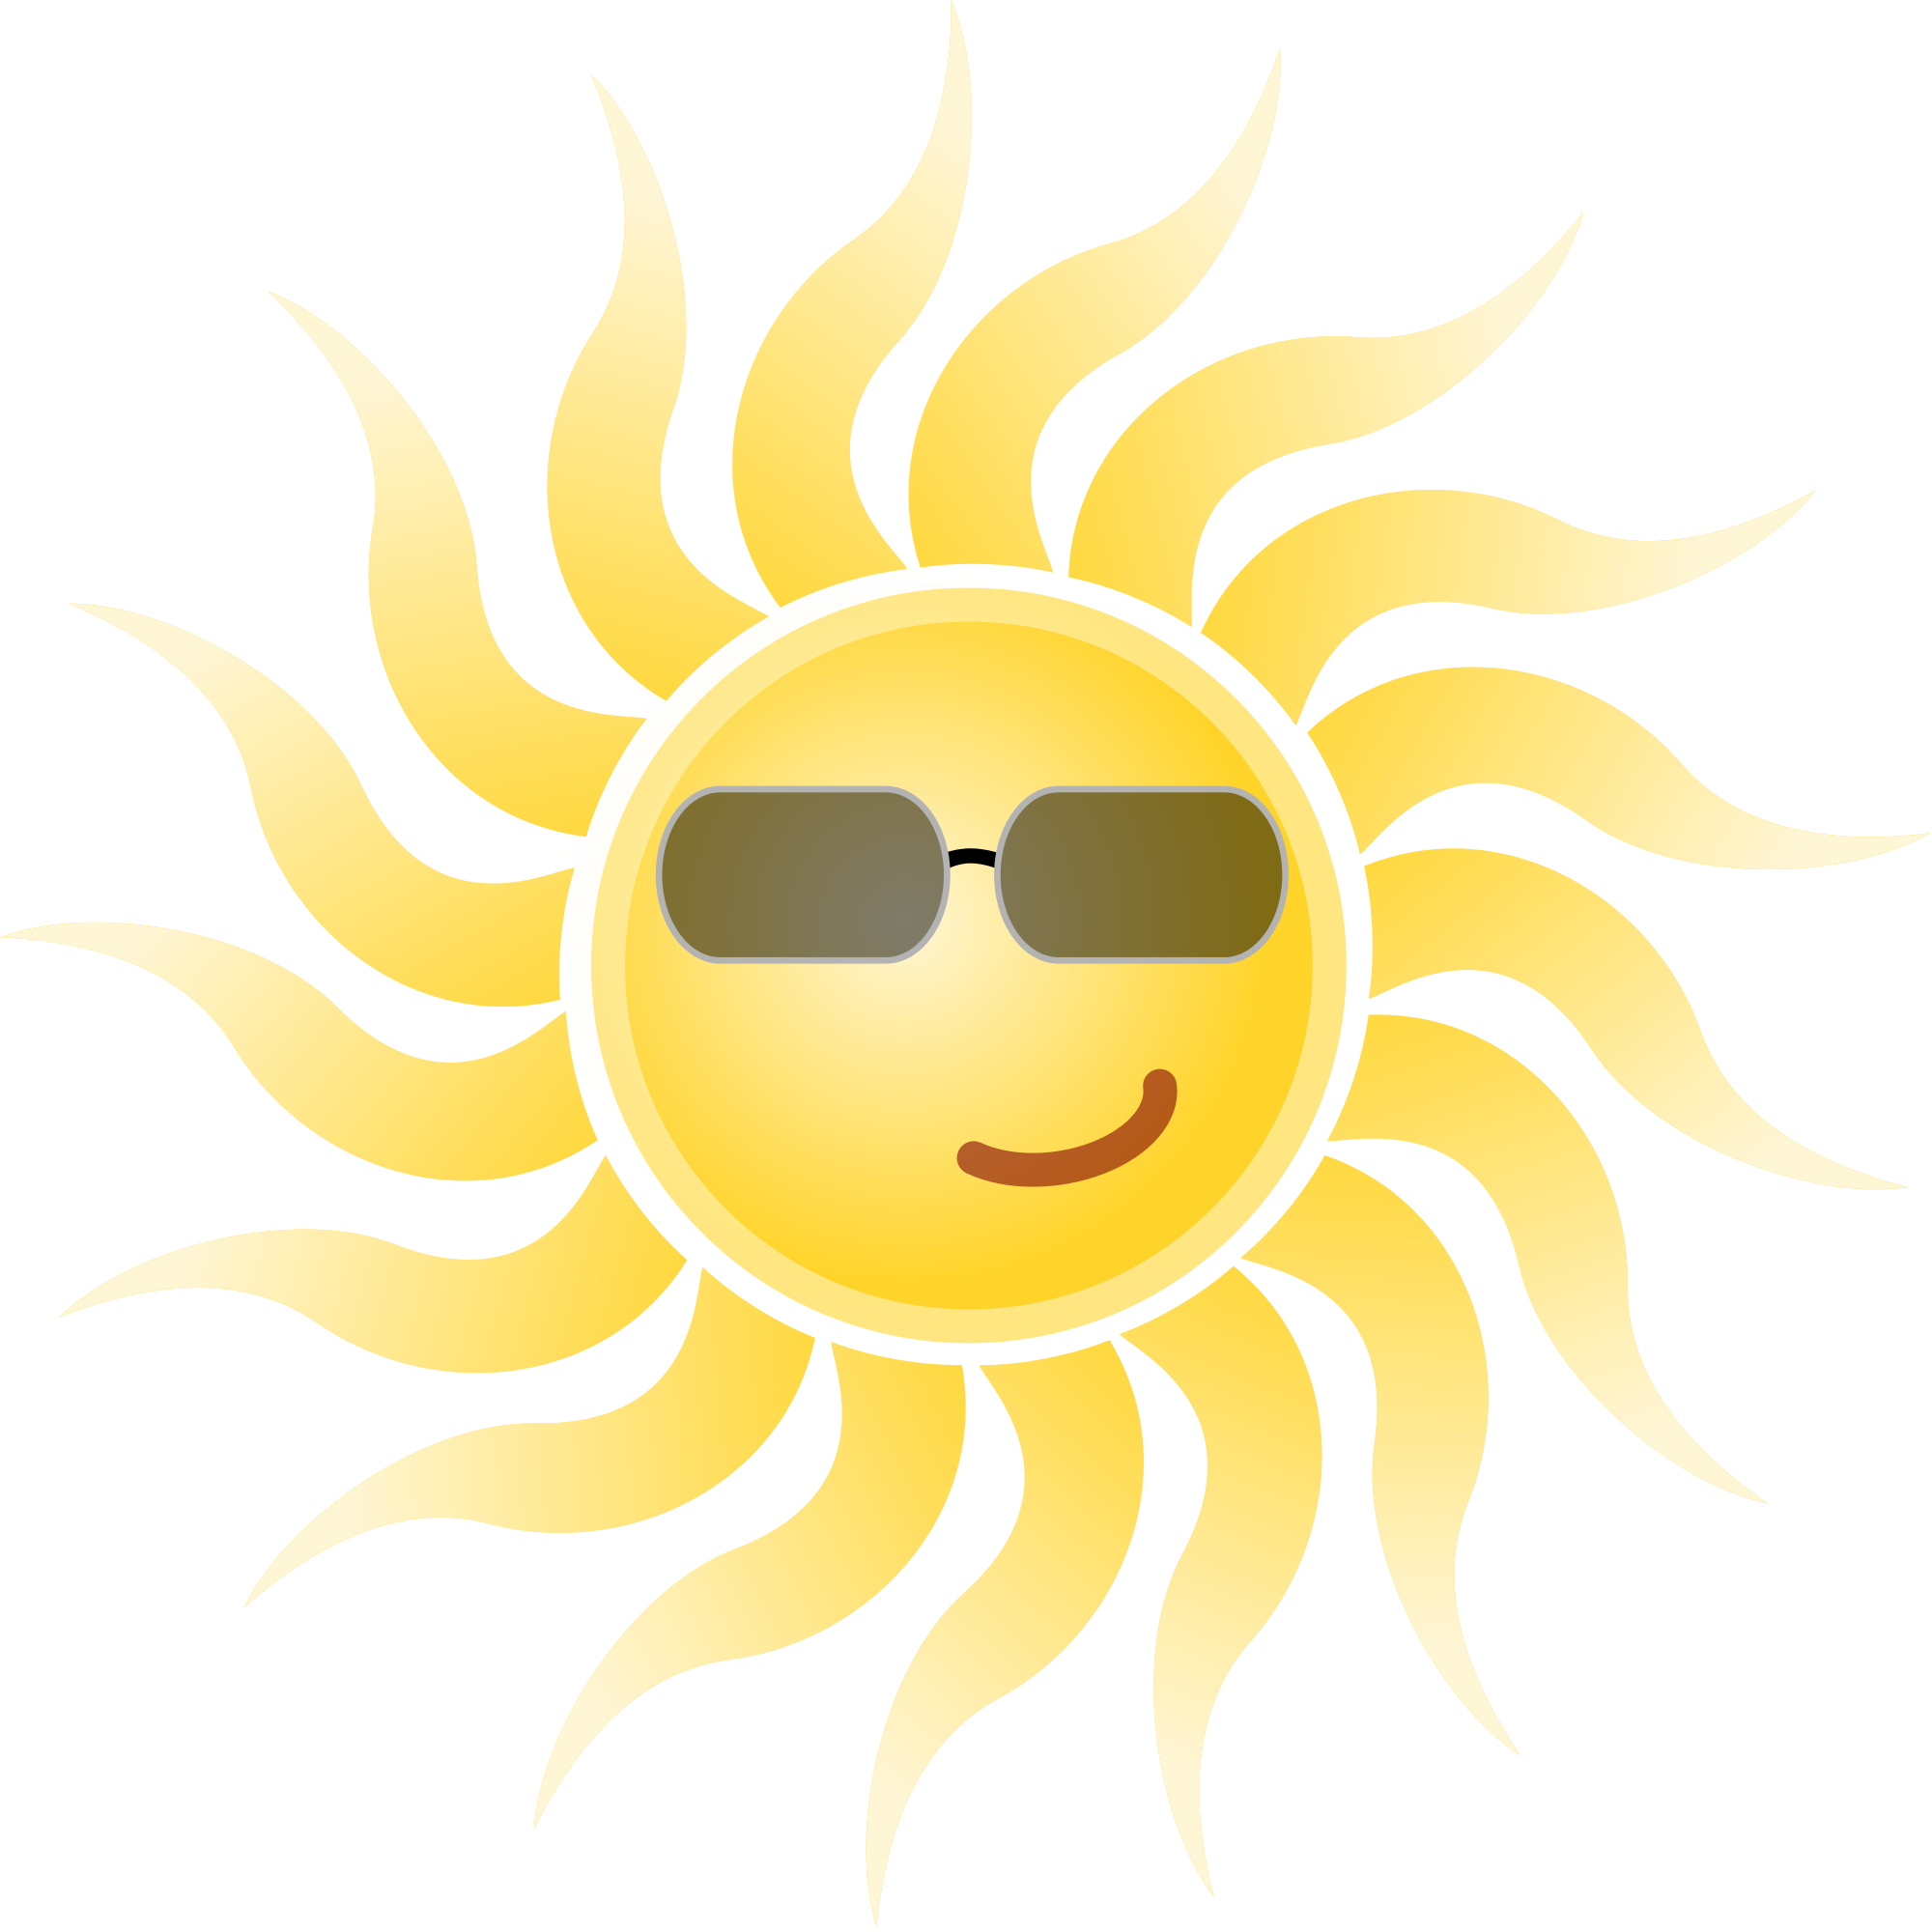 Sun with sunglasses file sun wearing sunglasses svg mediamons